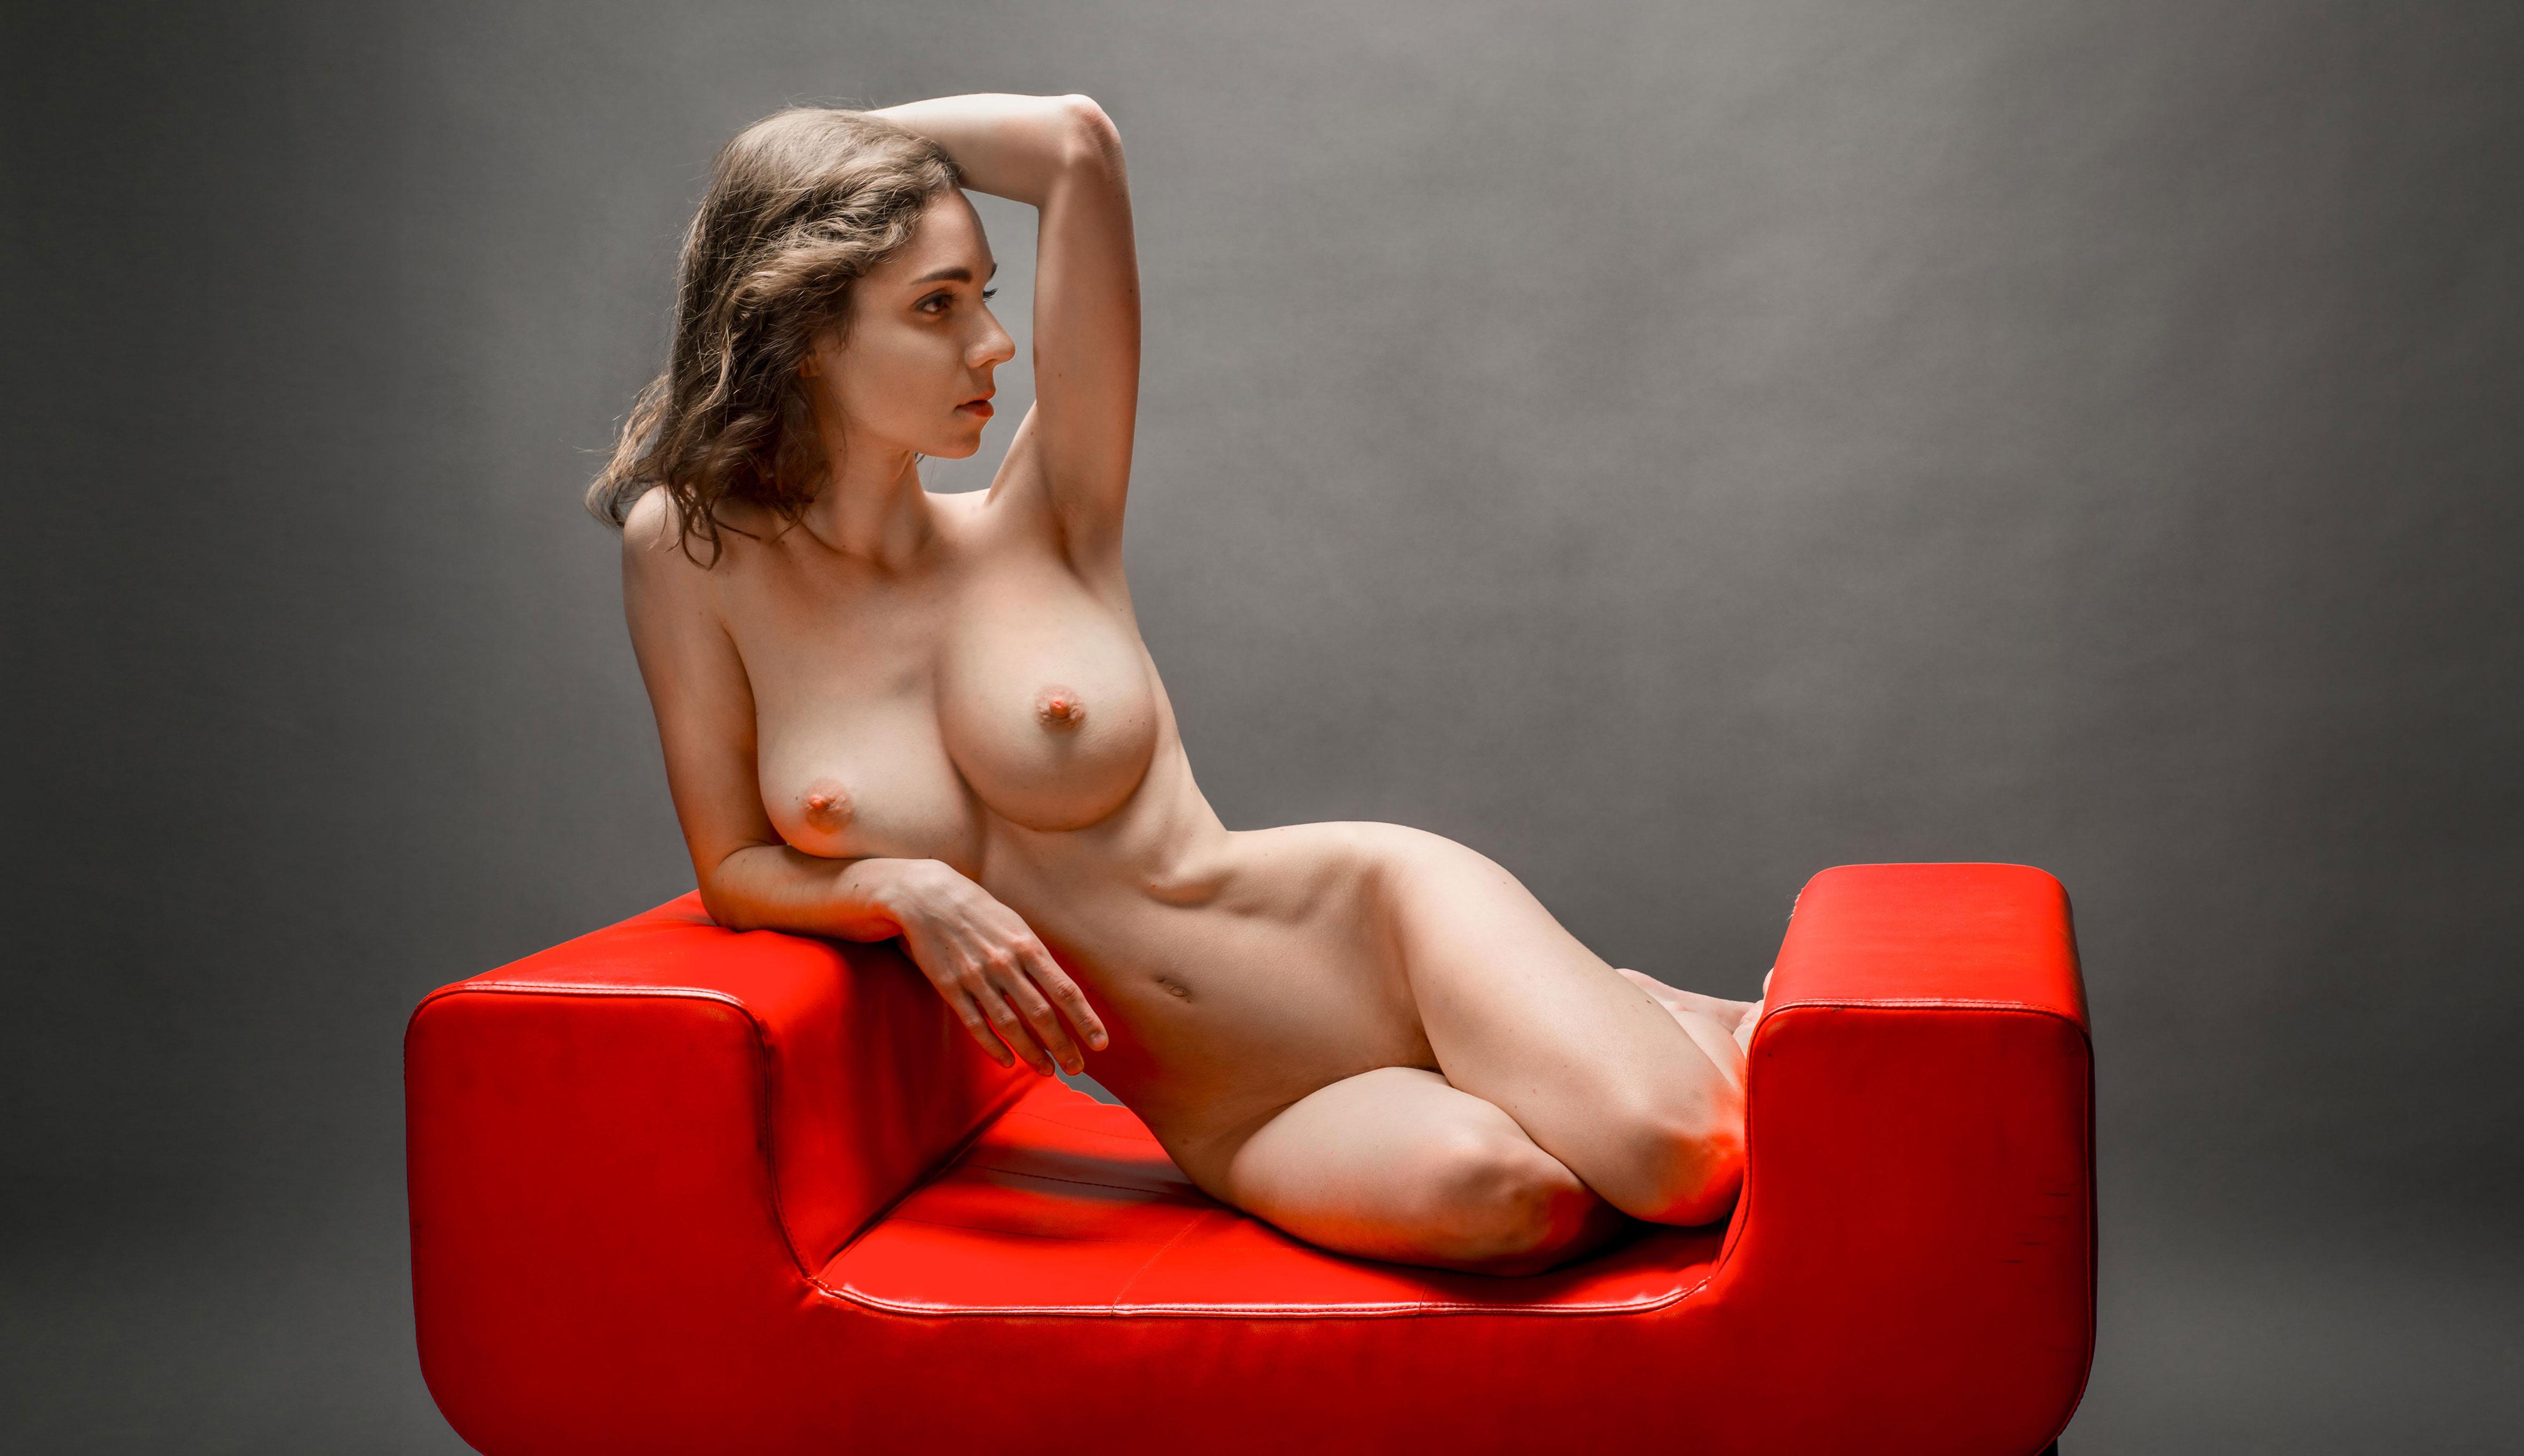 Голая Анна Меньшикова на красной банкетке / Anna Menshikova nude by Anton Smolsky